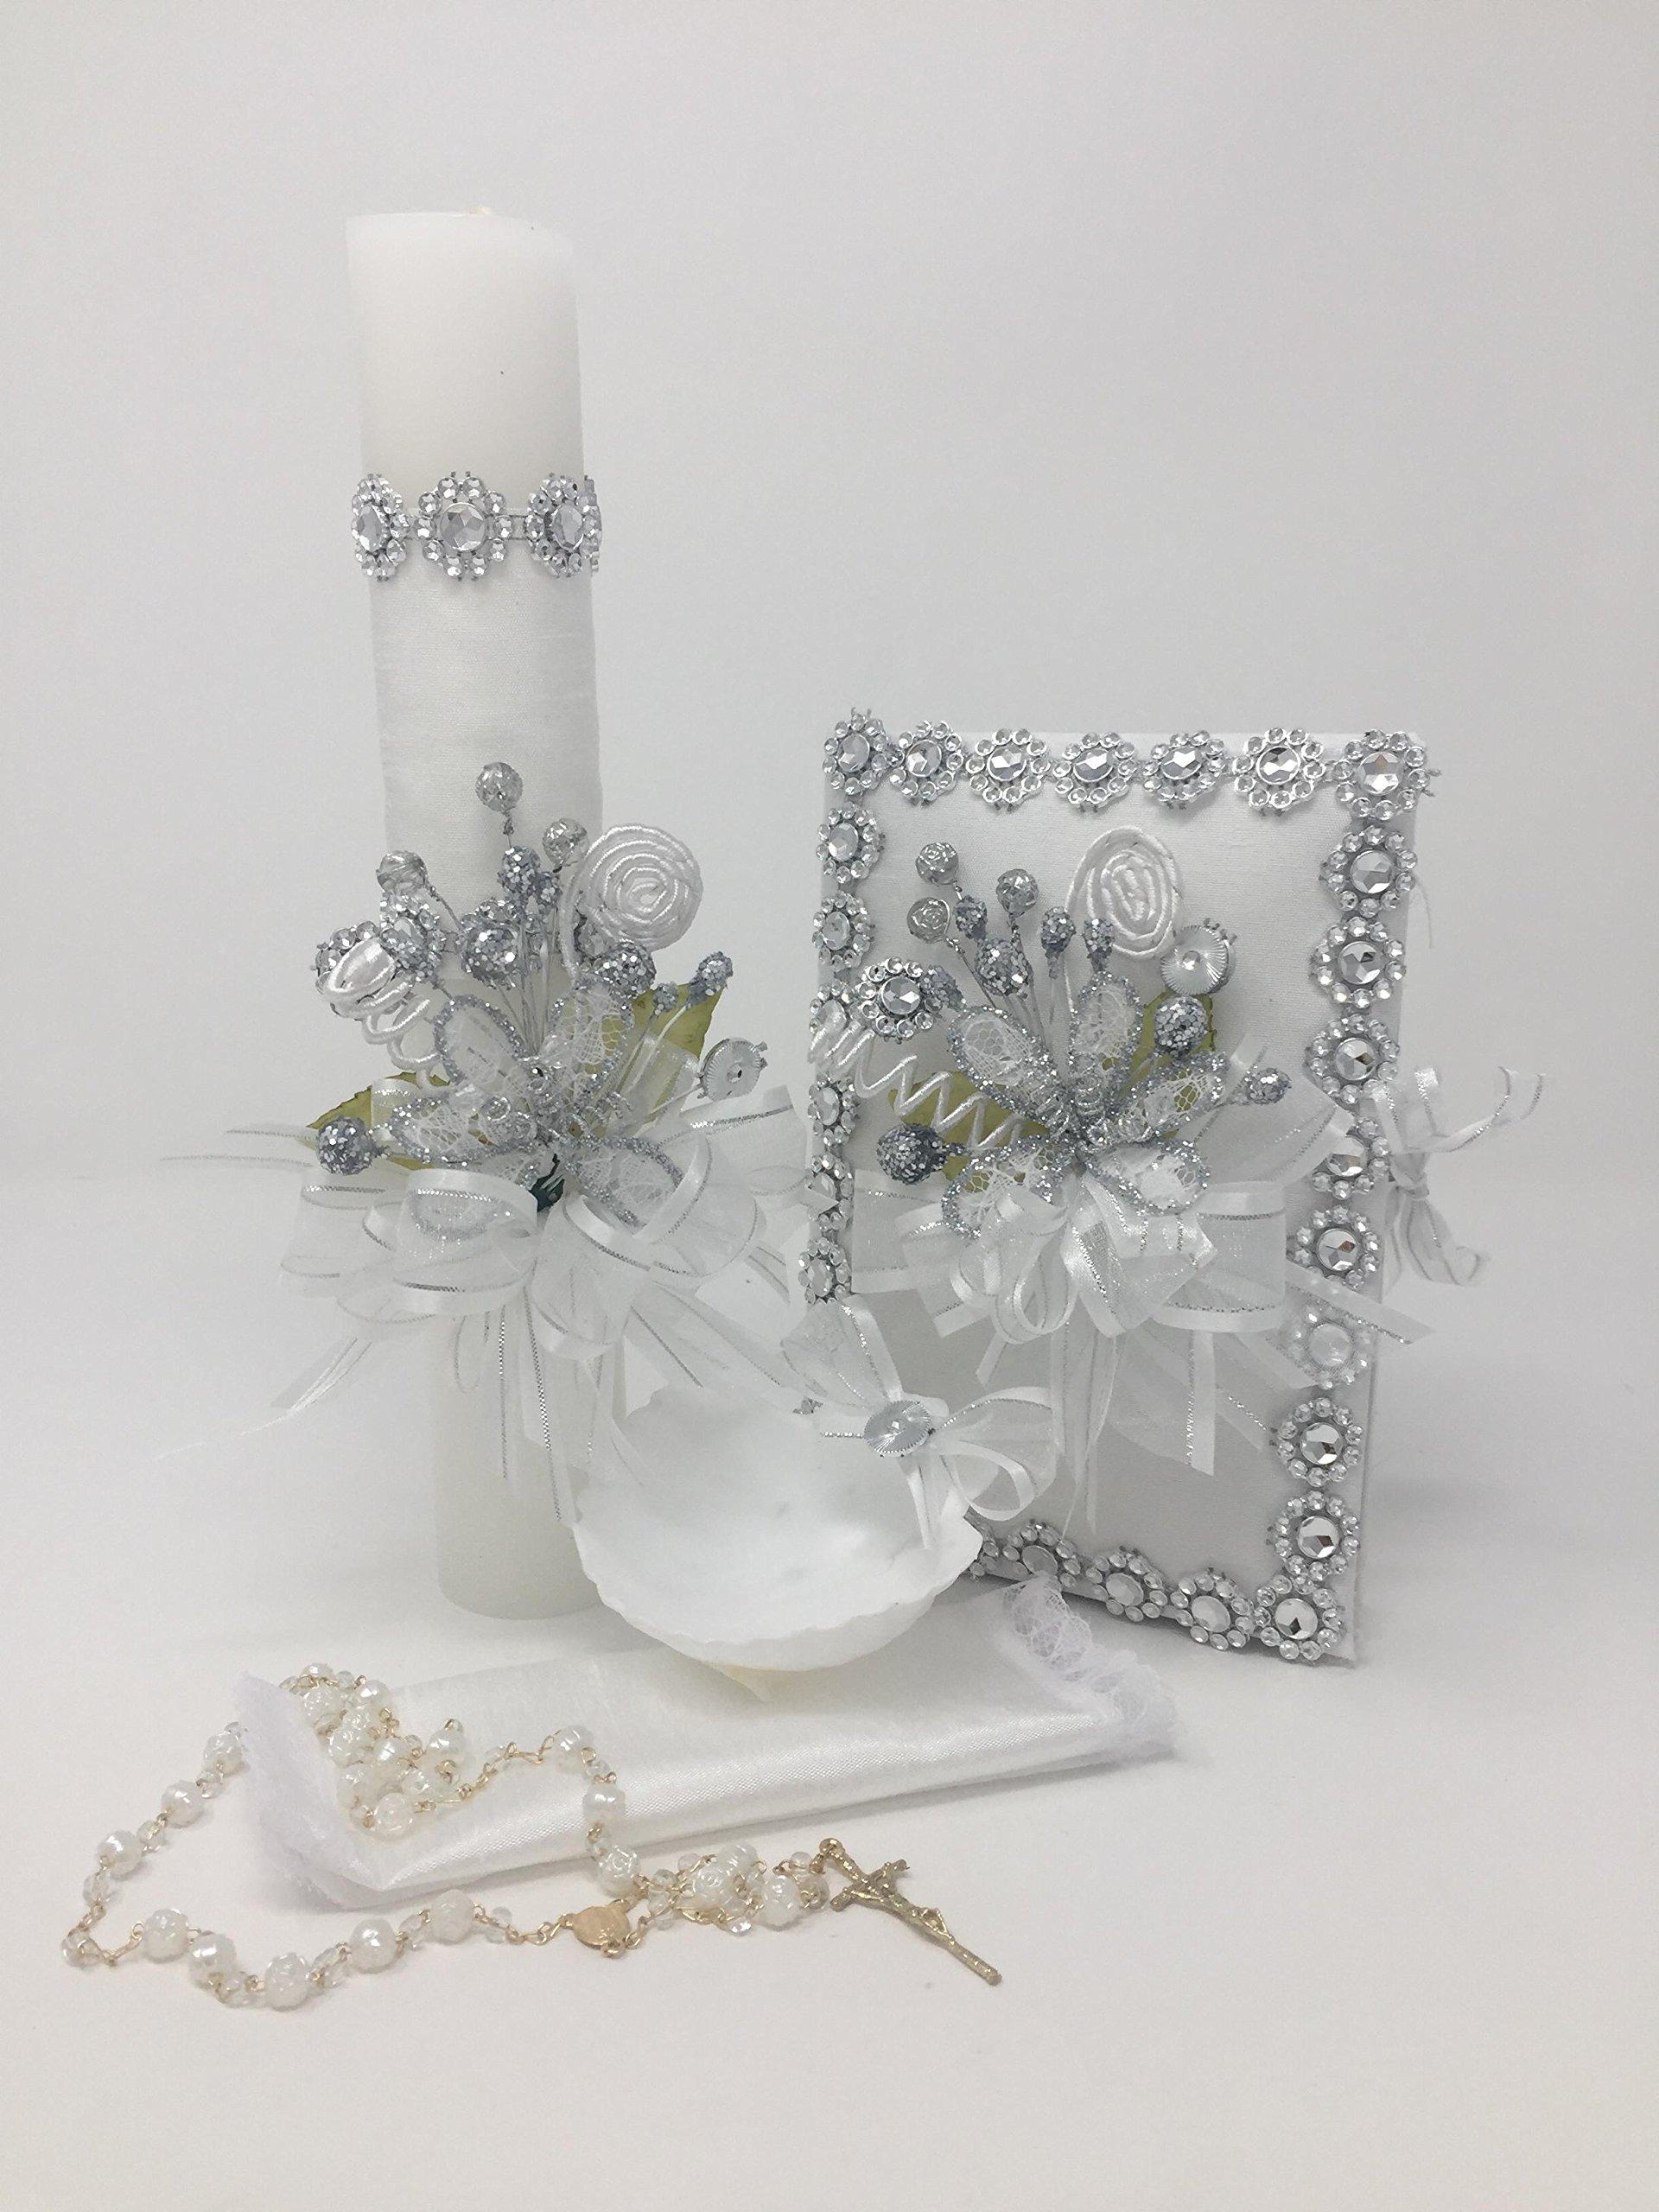 Casa Ixta Baptism candle set with cristal details